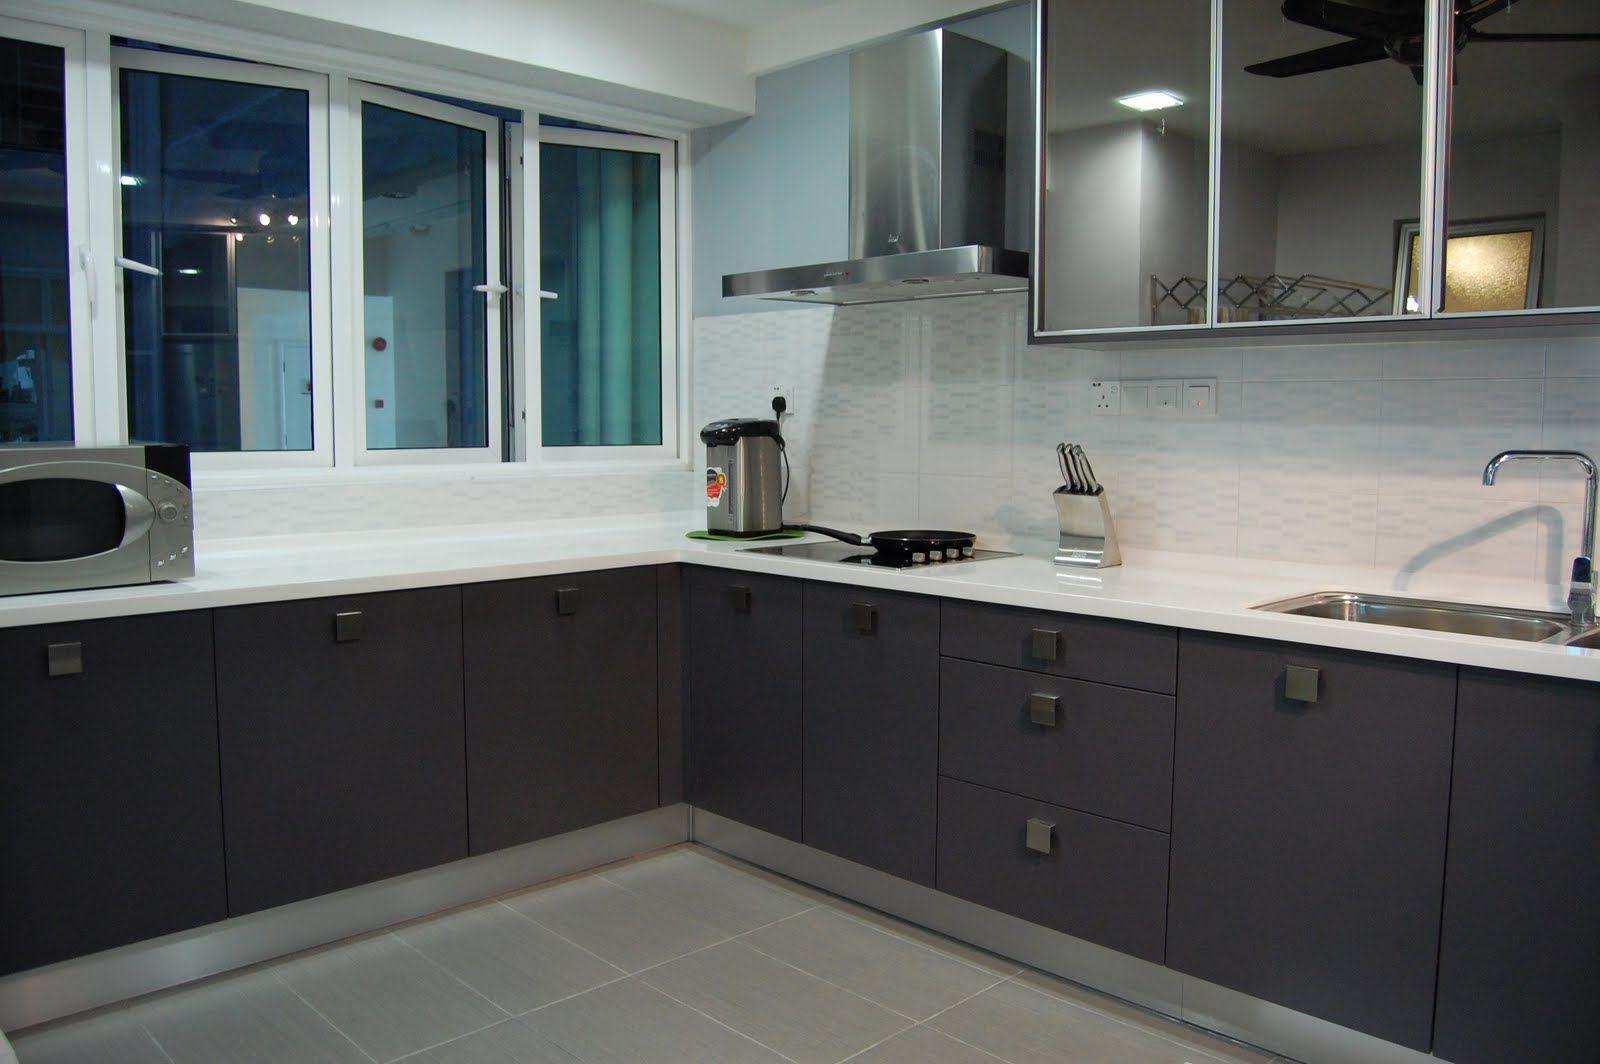 Sample House Interior Design Malaysia  Cozinha Provenc Impressive Wet Kitchen Design Decorating Design